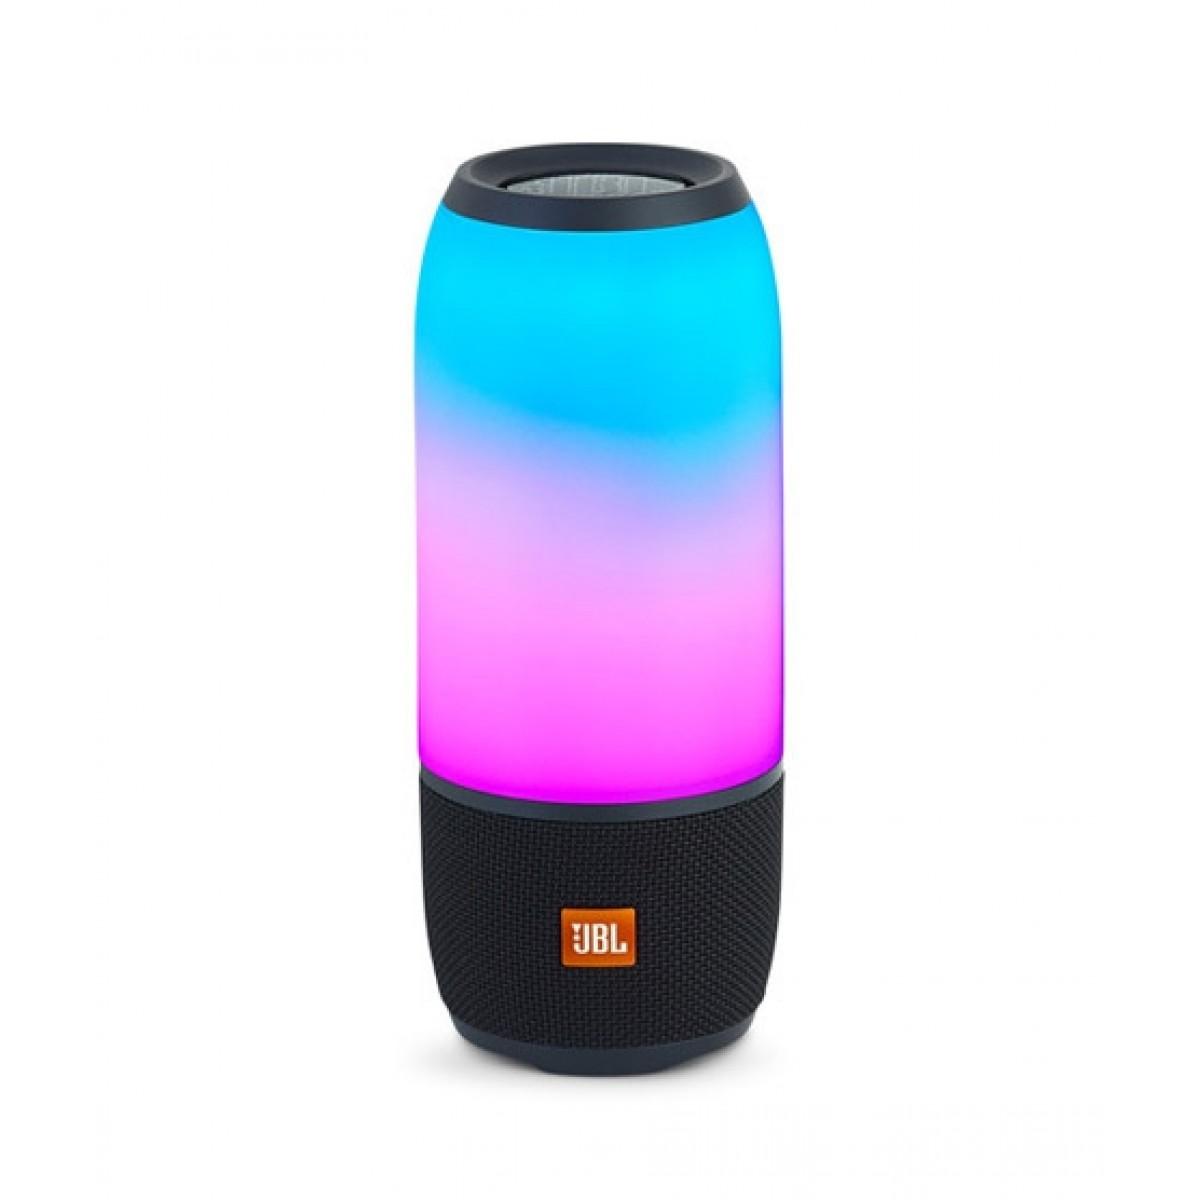 JBL Pulse 3 Portable Bluetooth Speaker Black